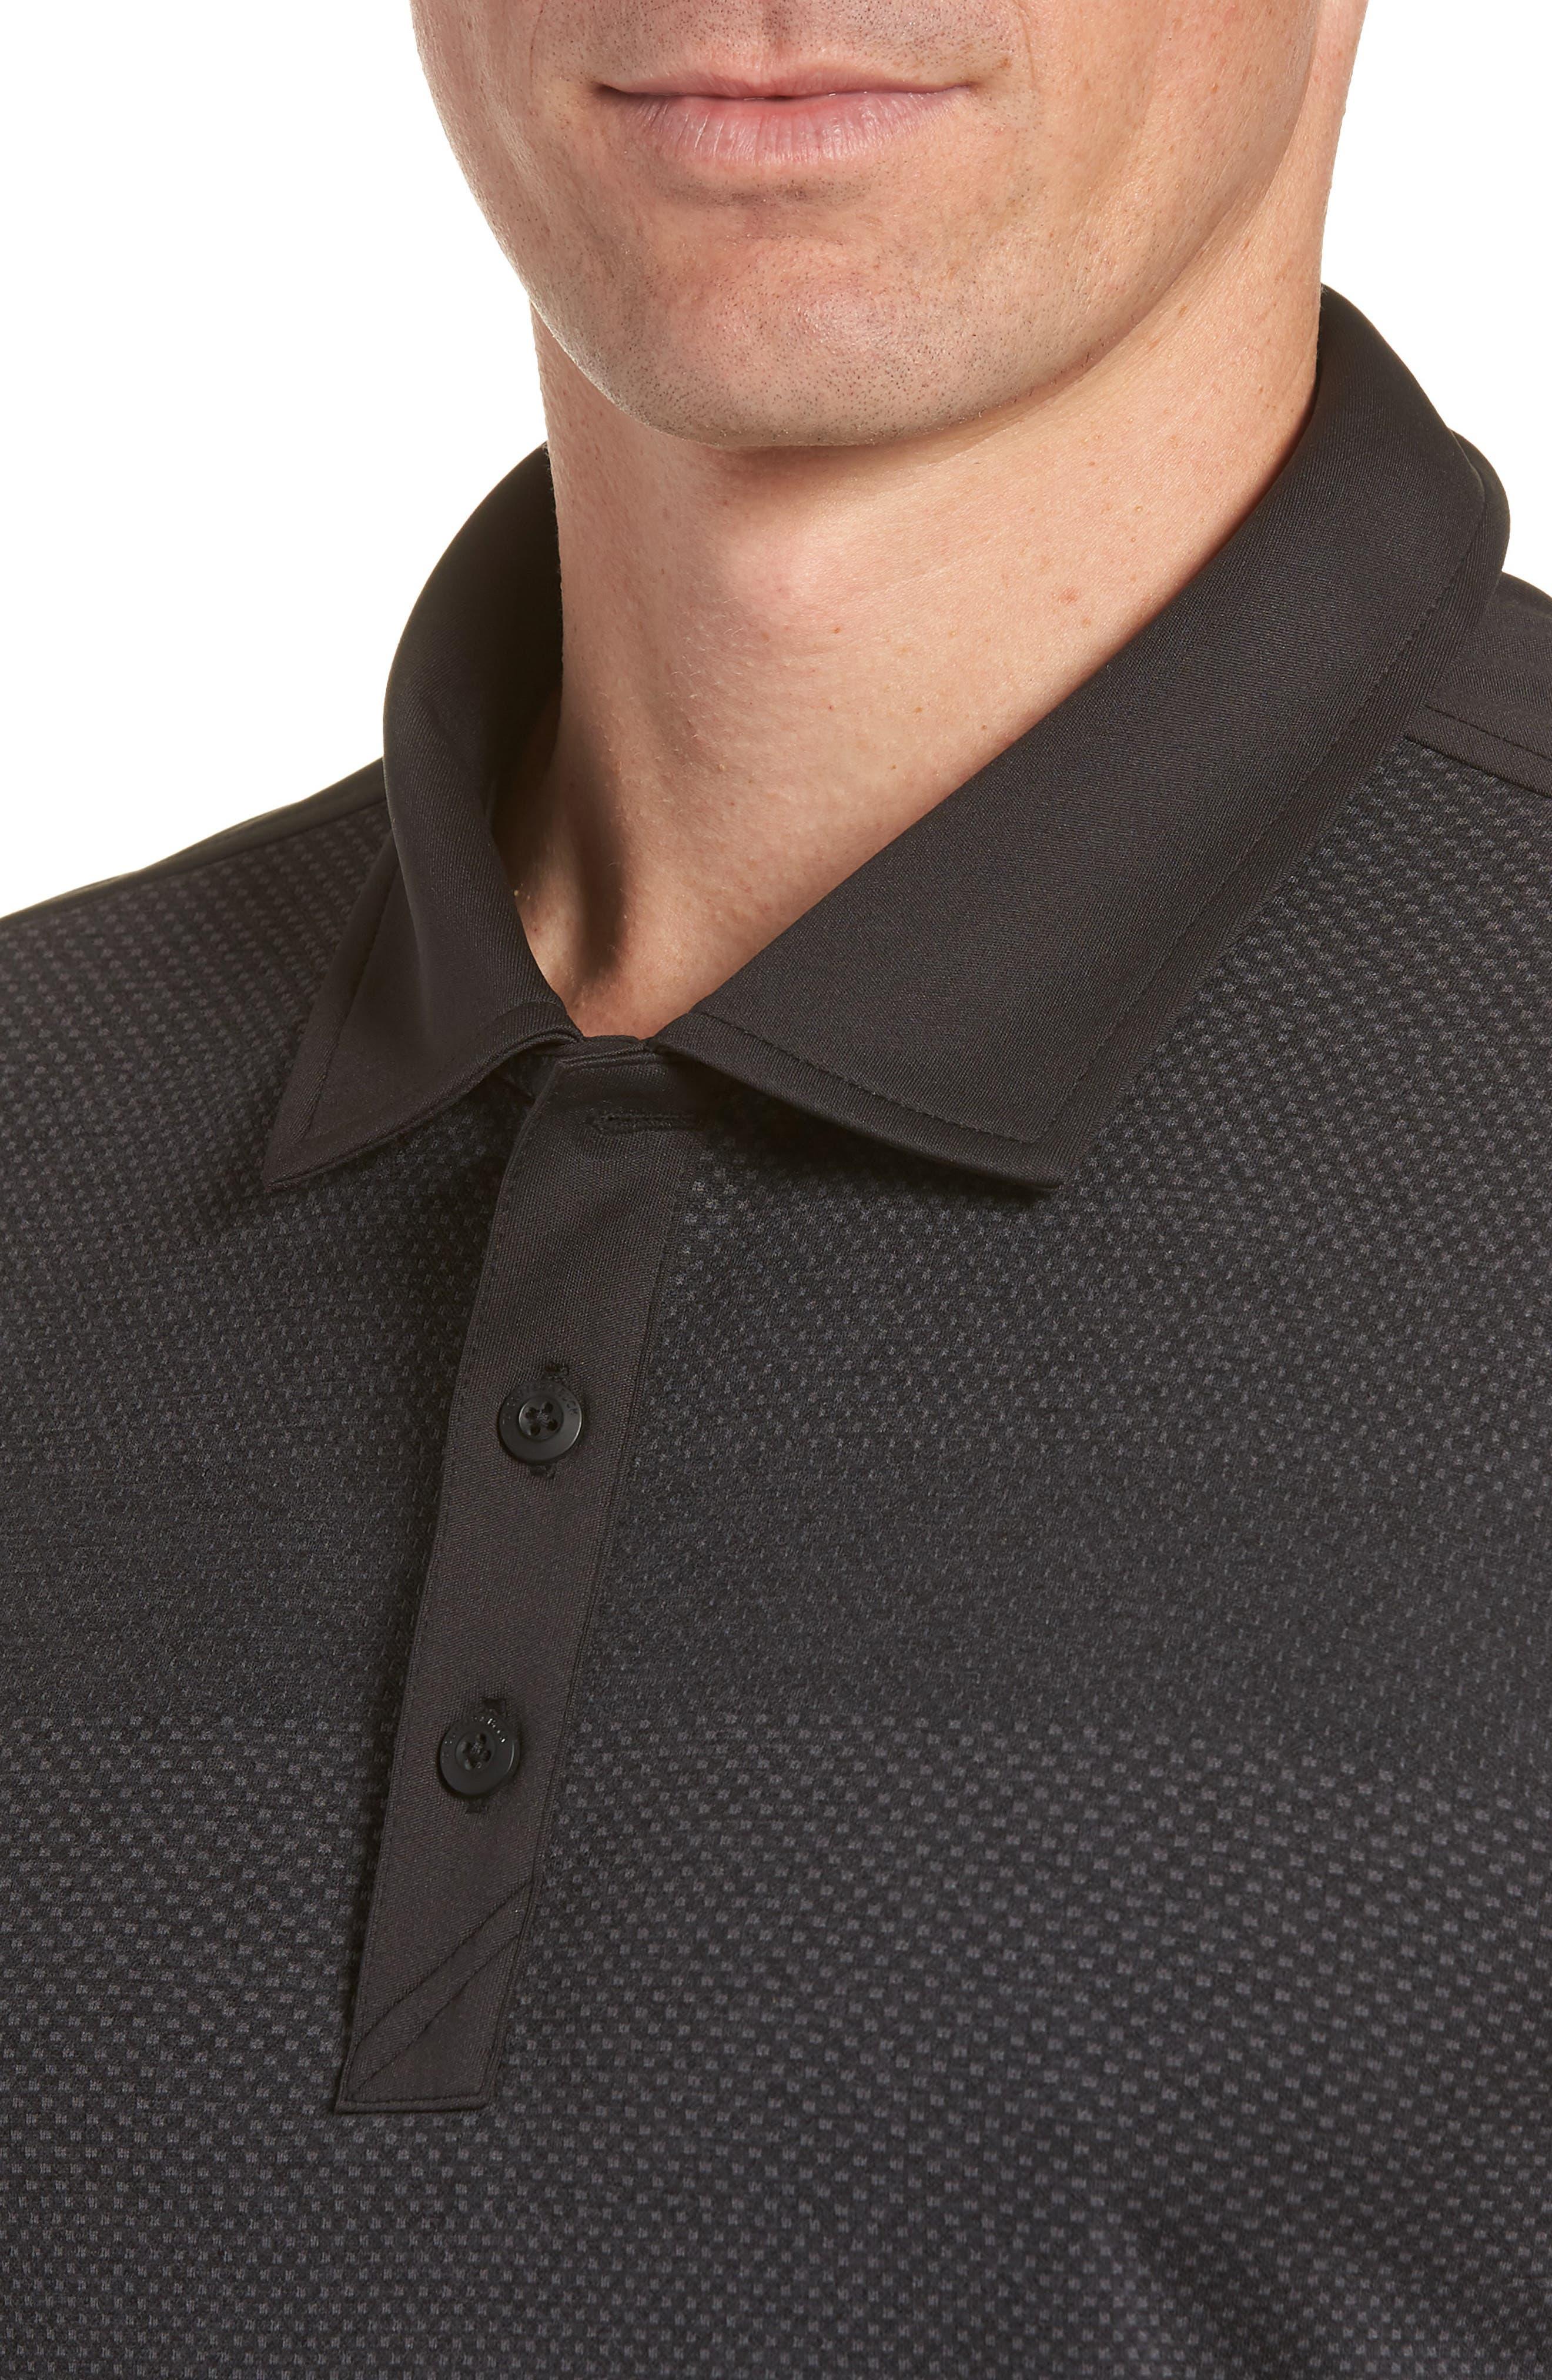 Crescent Striped Polo,                             Alternate thumbnail 4, color,                             BLACK